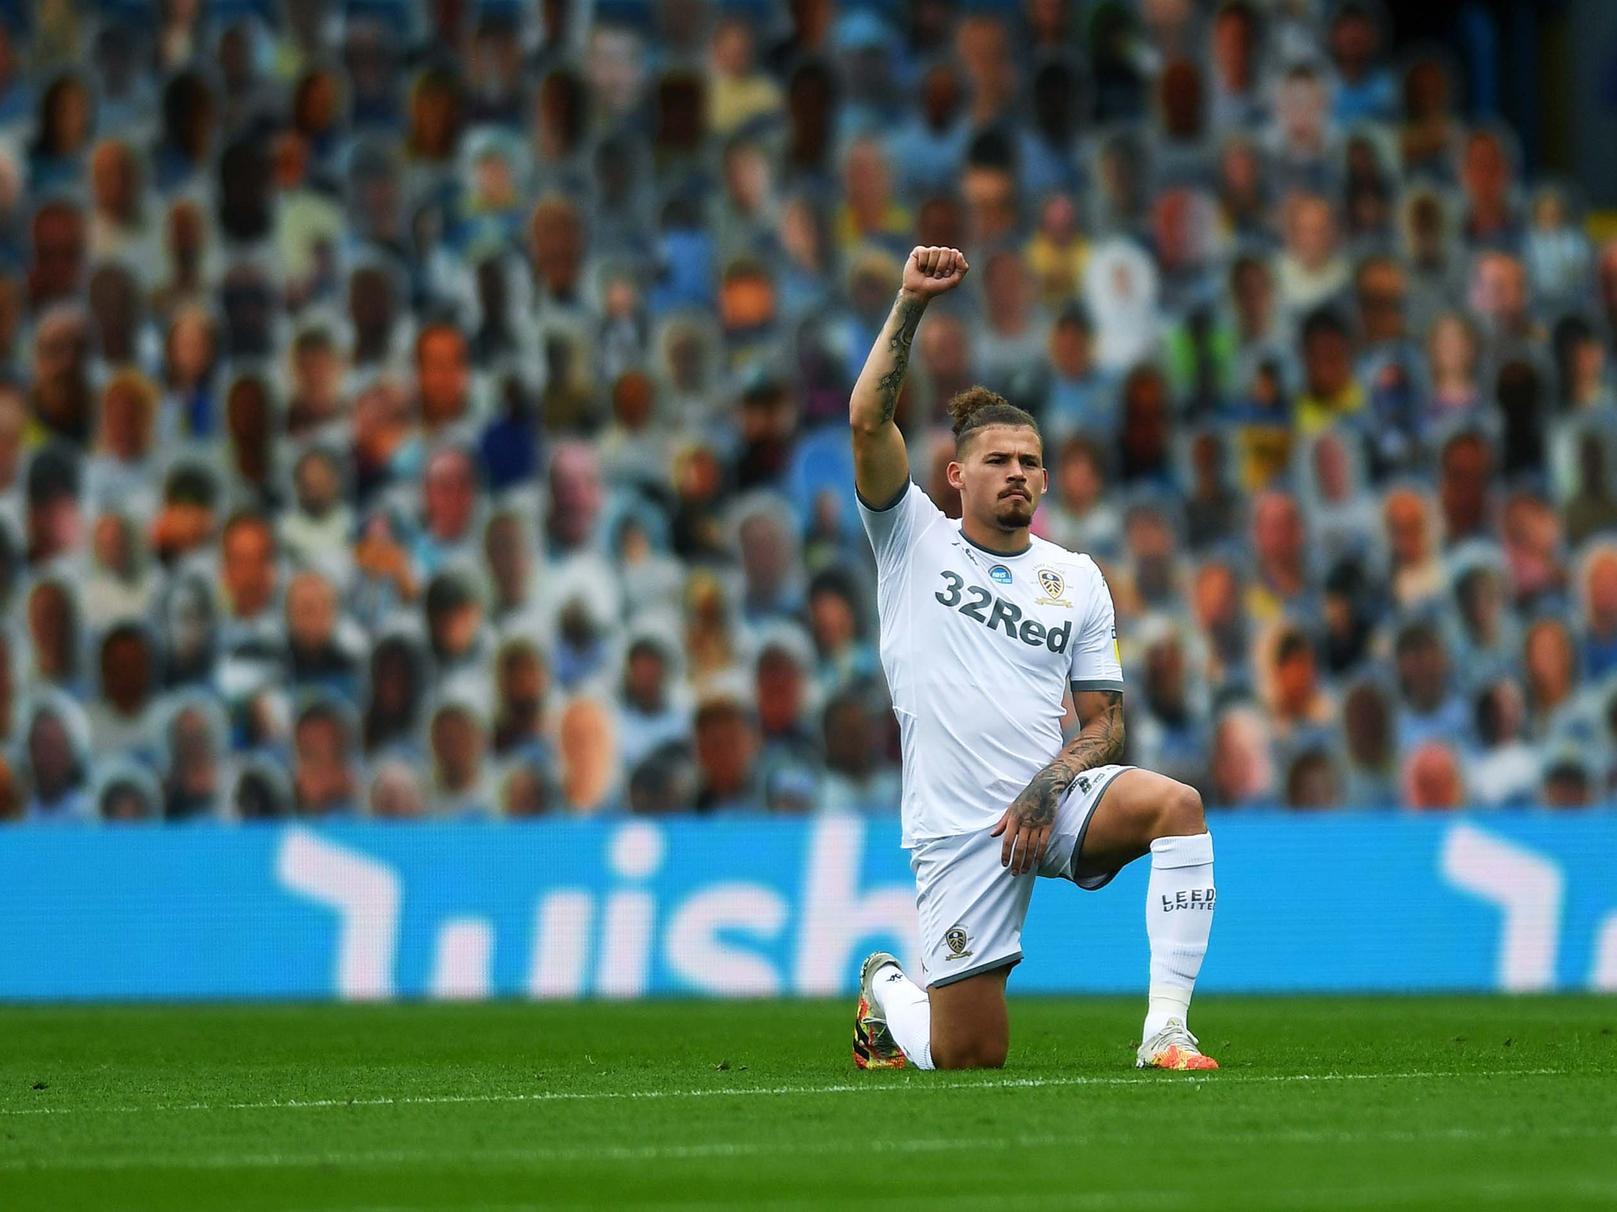 Pride of Leeds Kalvin Phillips and Marcus Rashford won't 'stick to football' - Graham Smyth